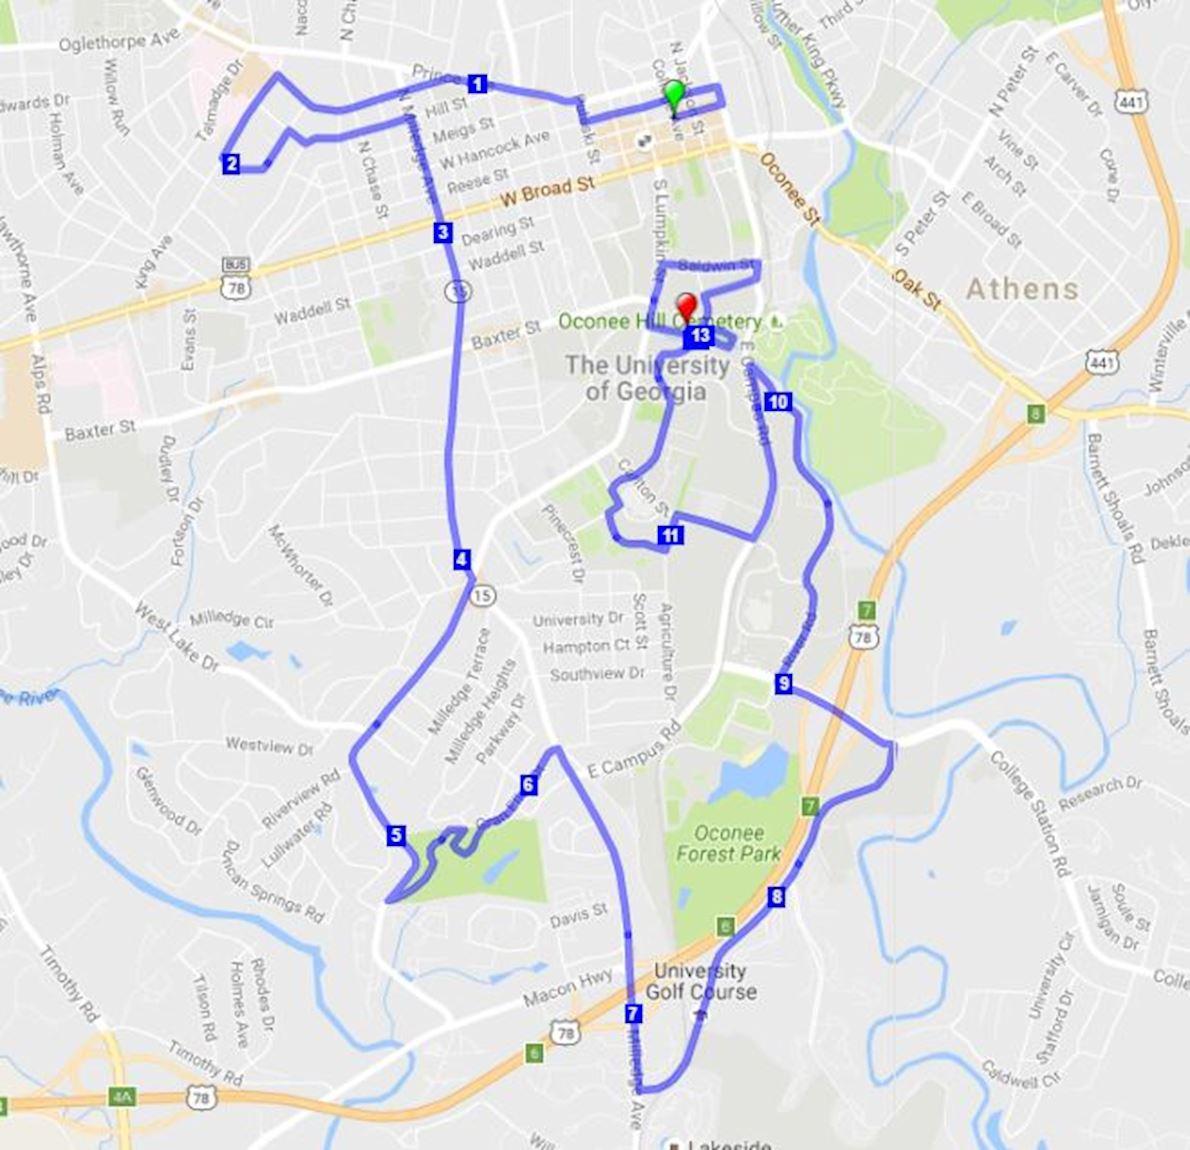 Athhalf - Athens, Georgia Half Marathon 路线图